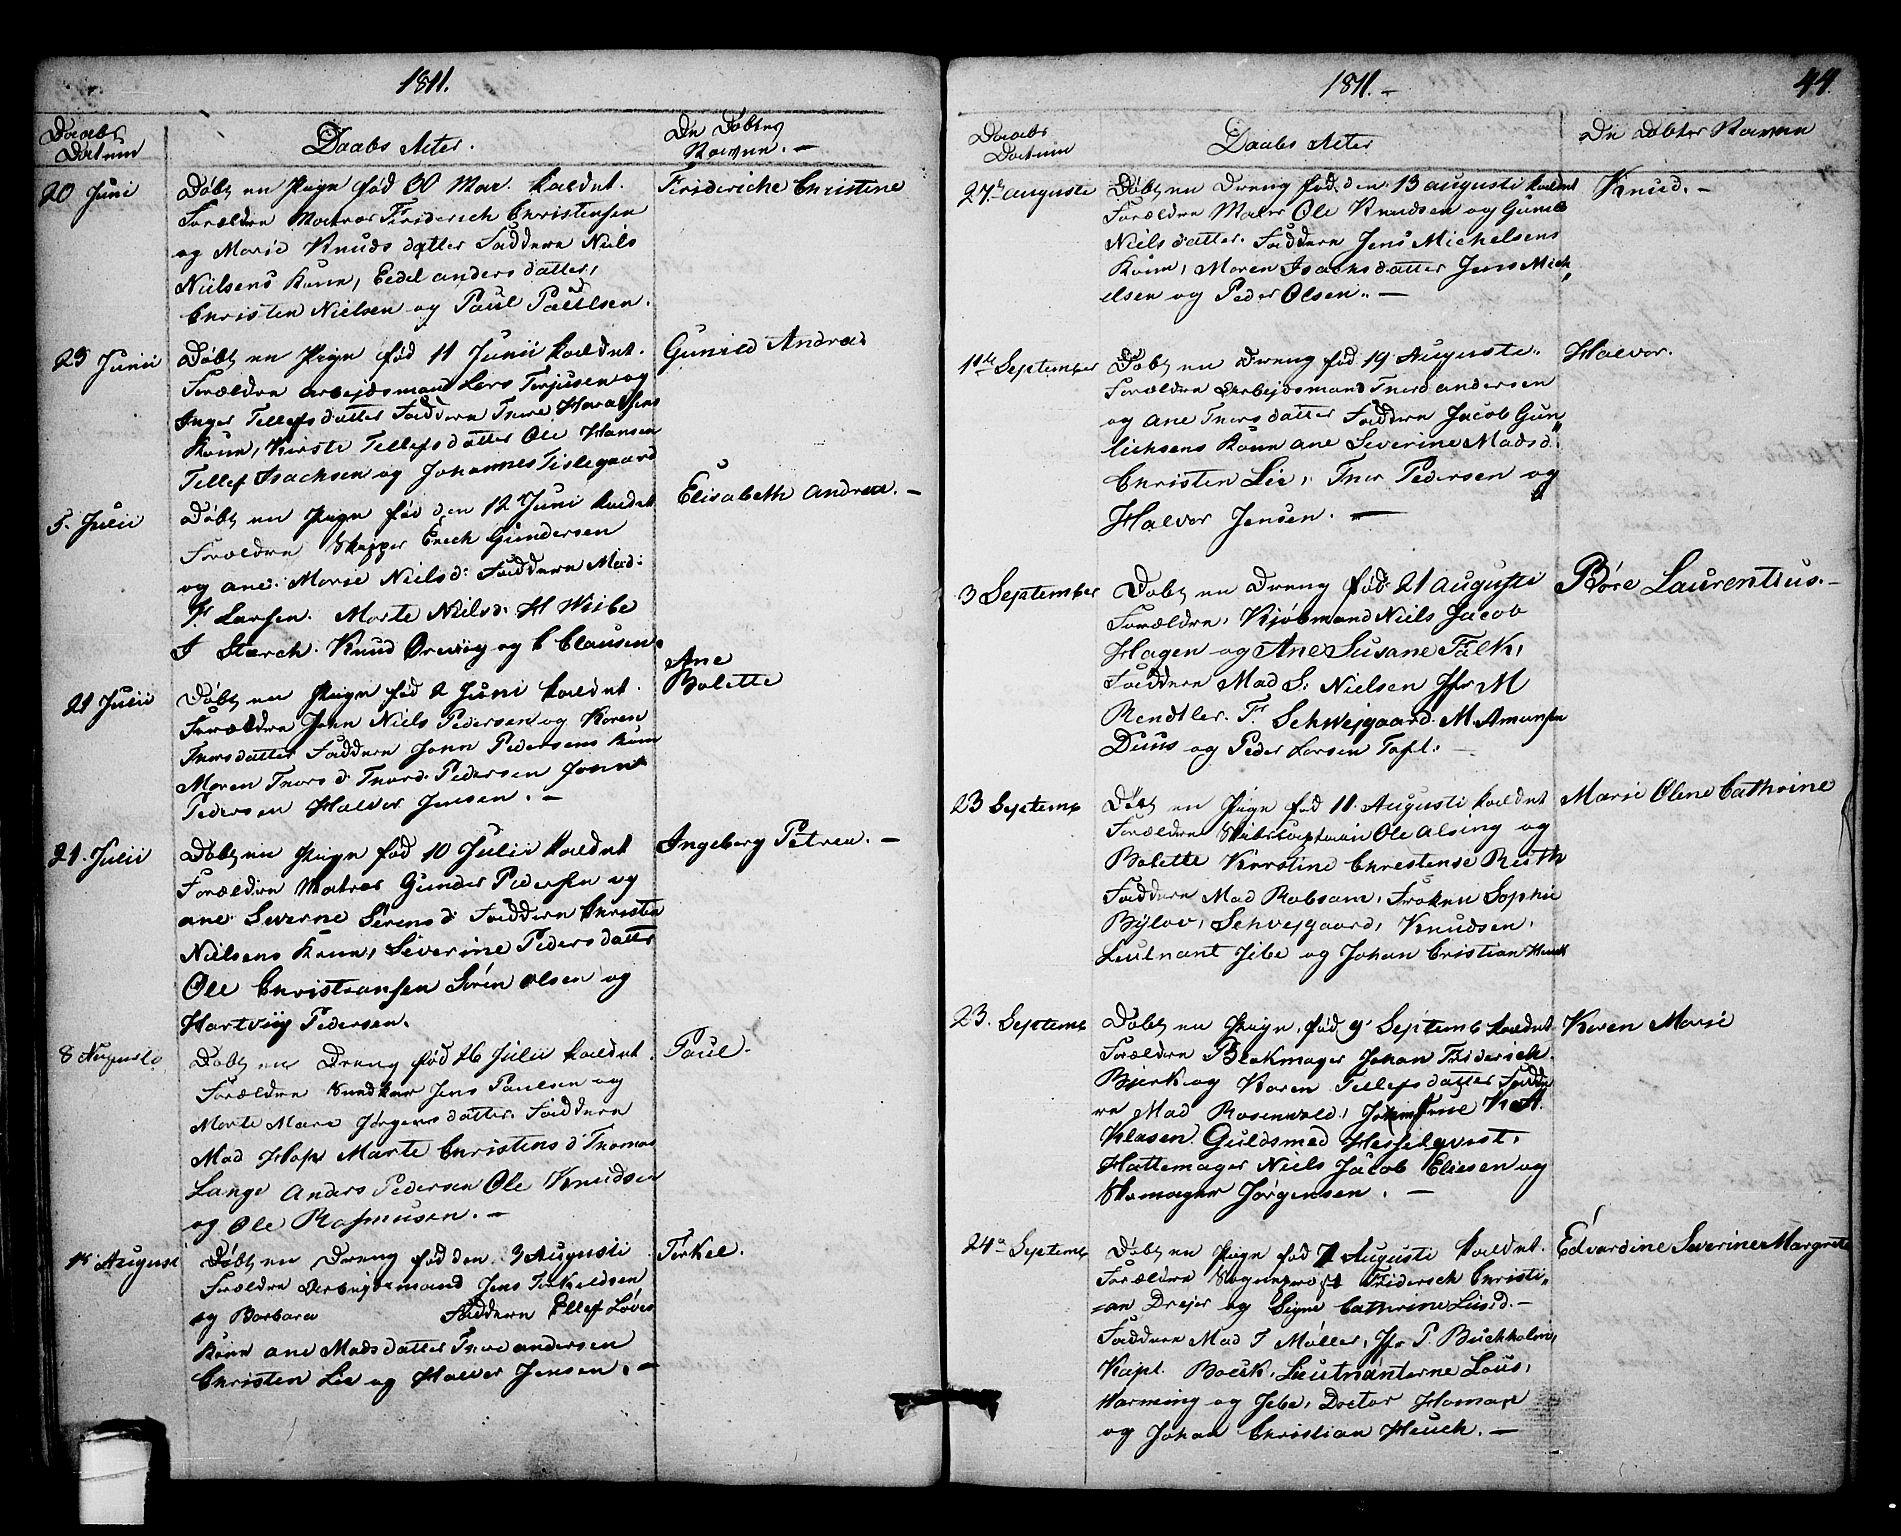 SAKO, Kragerø kirkebøker, F/Fa/L0003: Ministerialbok nr. 3, 1802-1813, s. 44